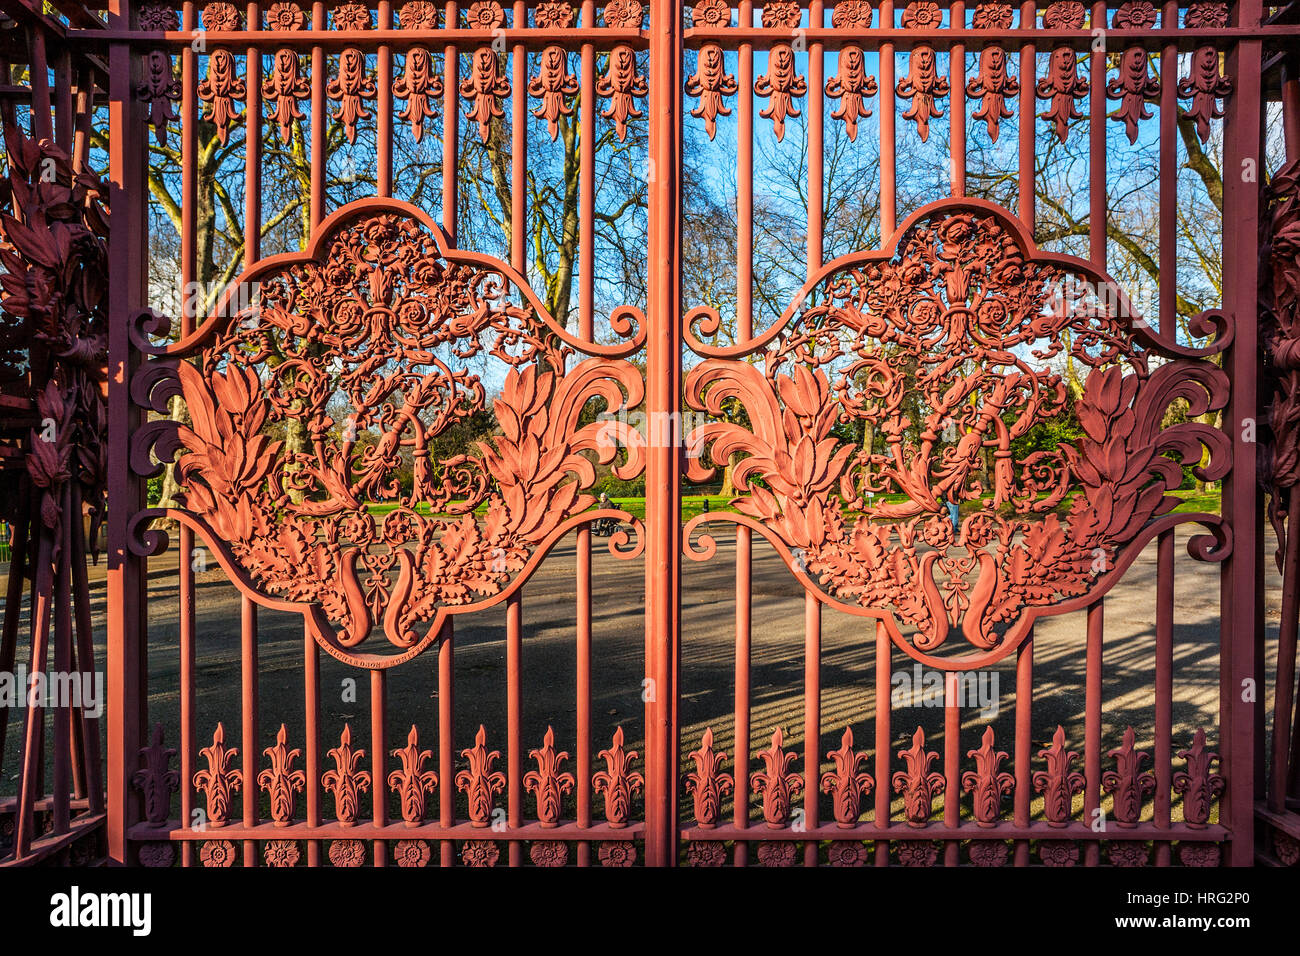 Queen's Gate with VR Motif, Kensington Gardens, London - Stock Image